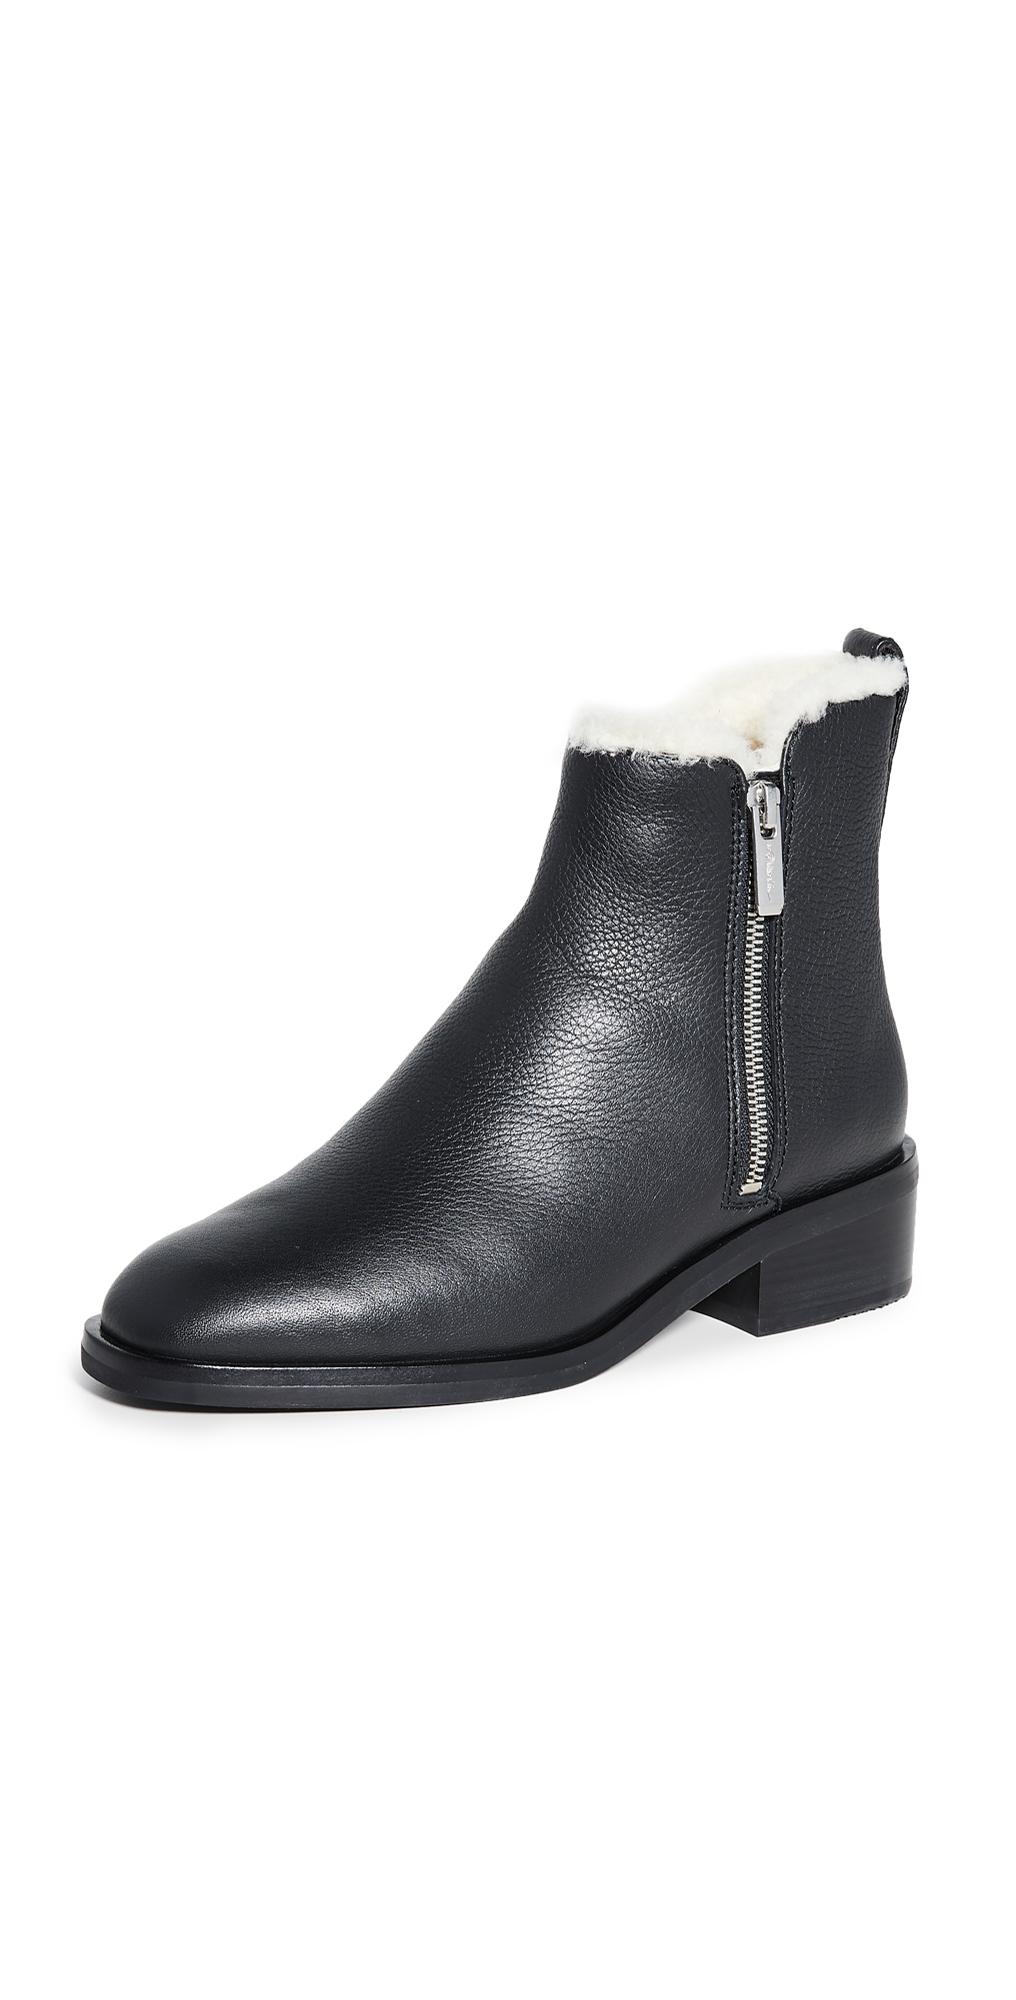 3.1 Phillip Lim Alexa 40mm Shearling Boots